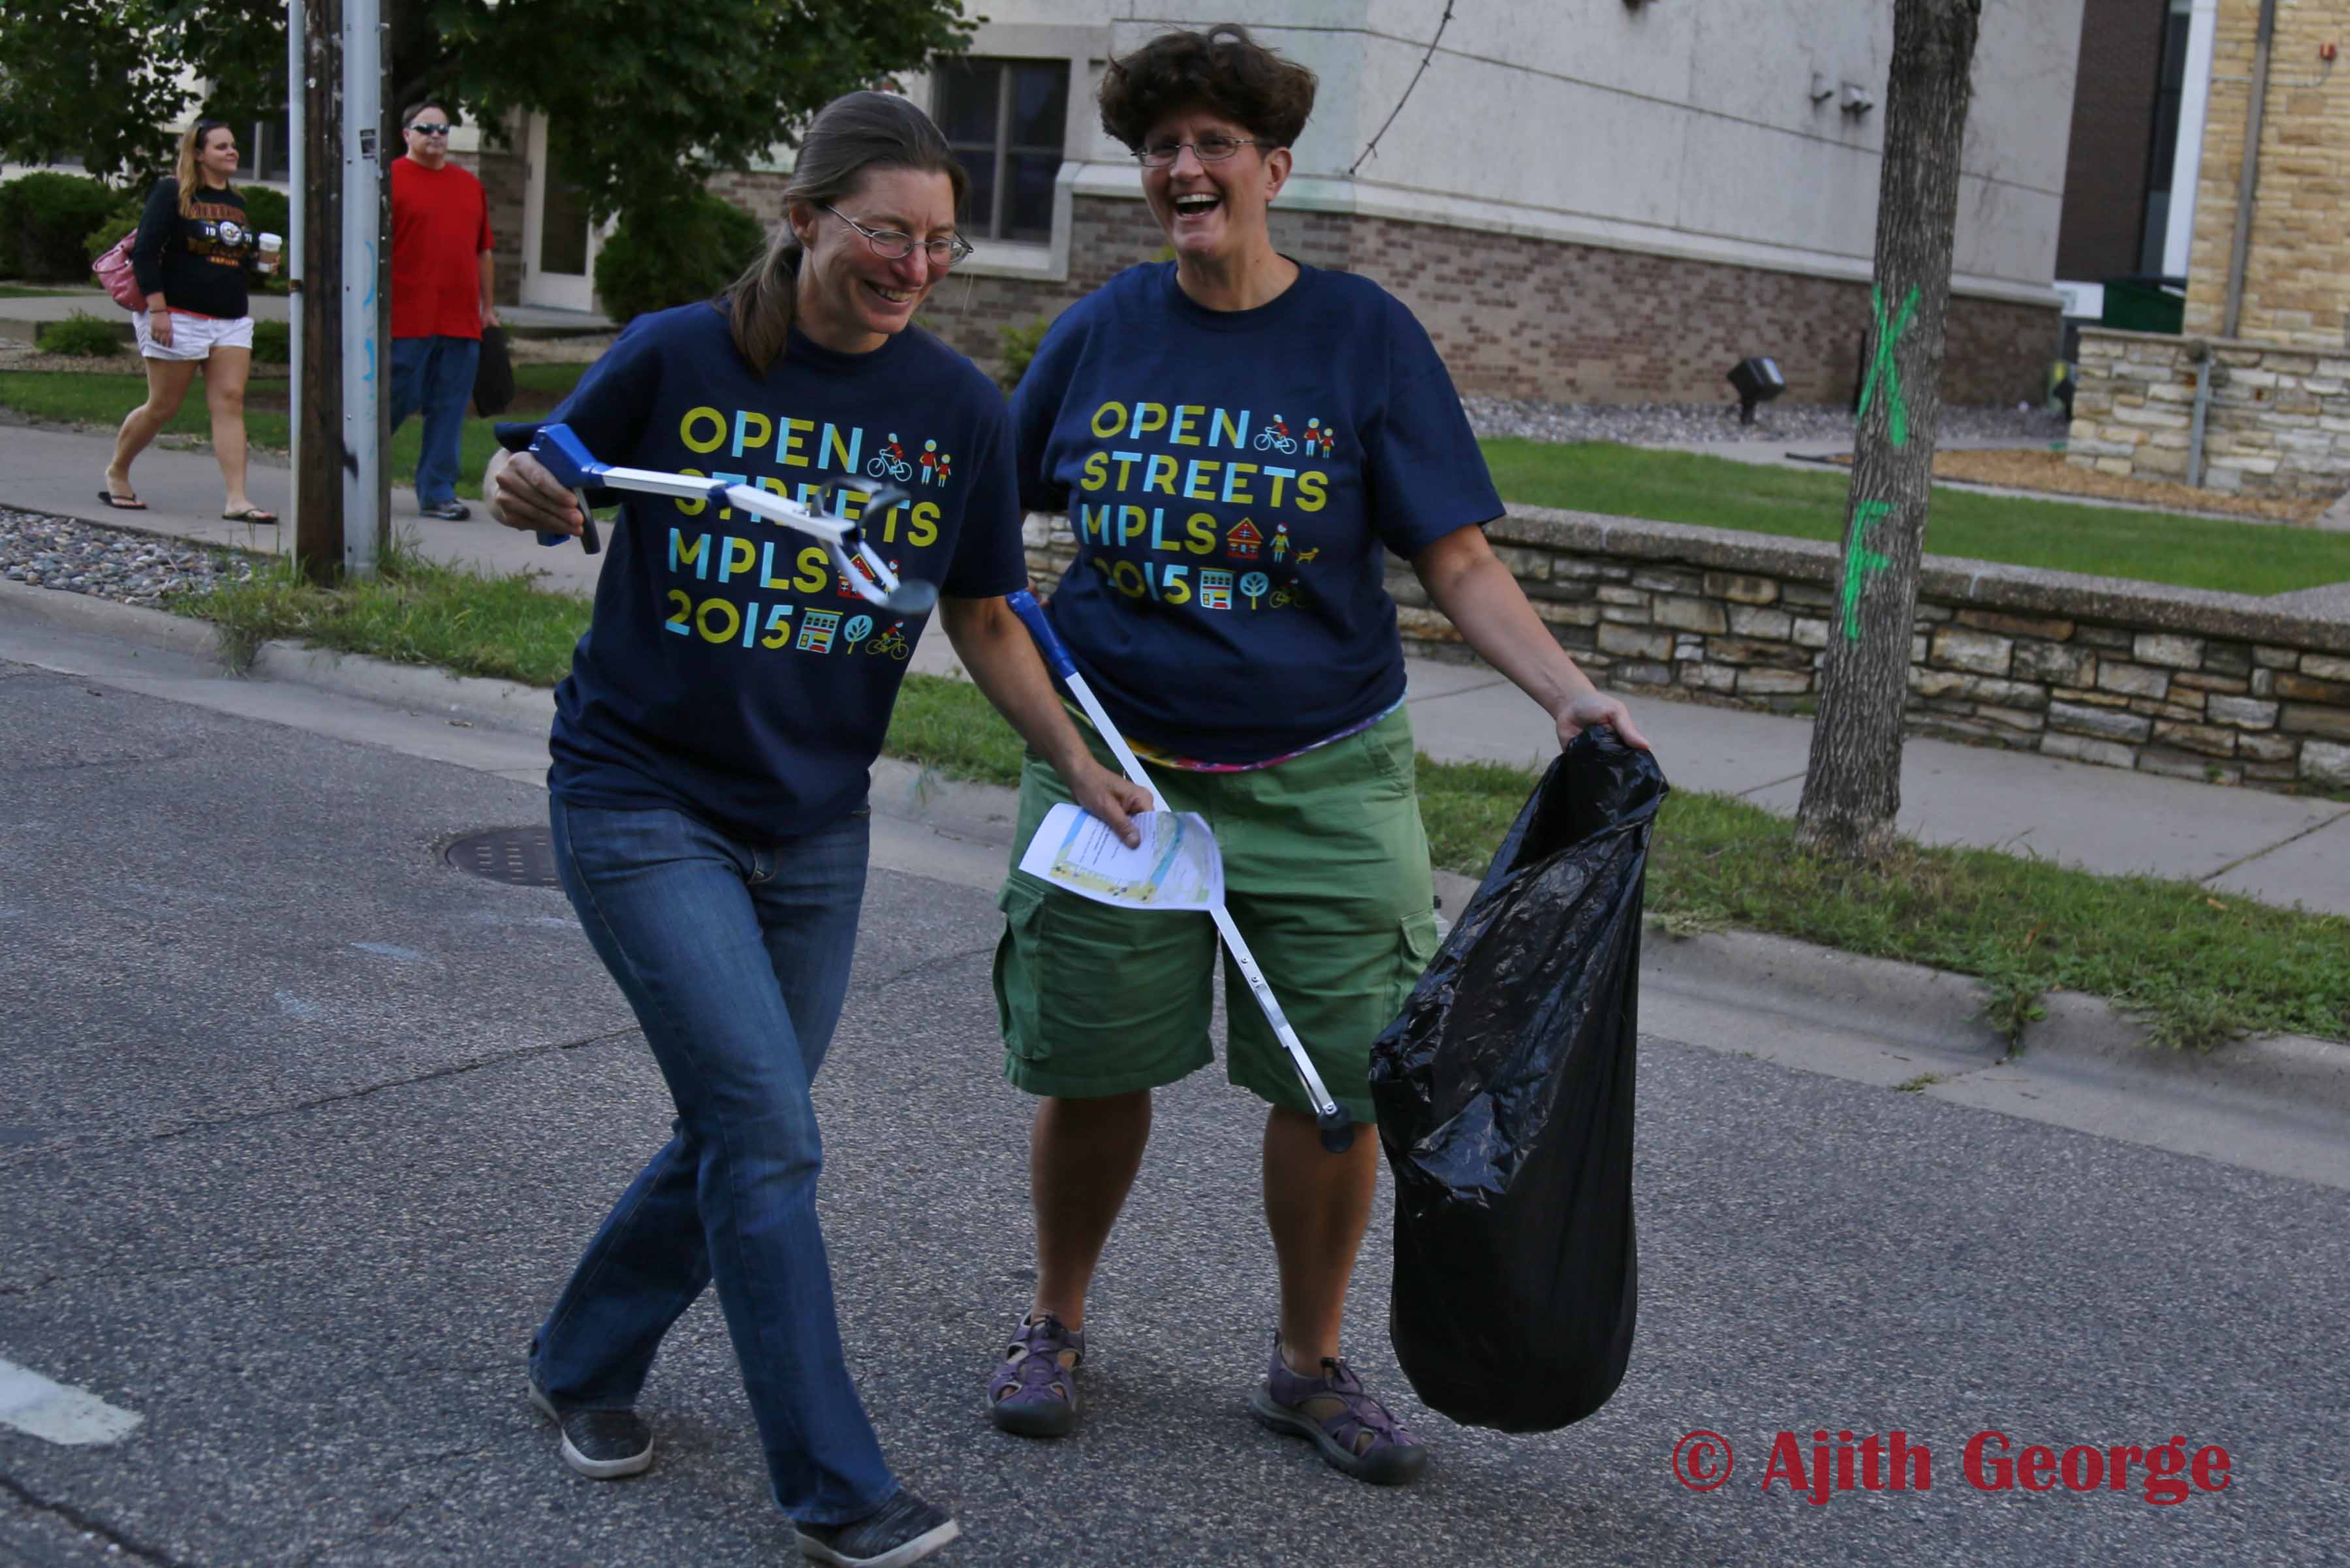 Volunteer_with_your_Neighbors.jpg